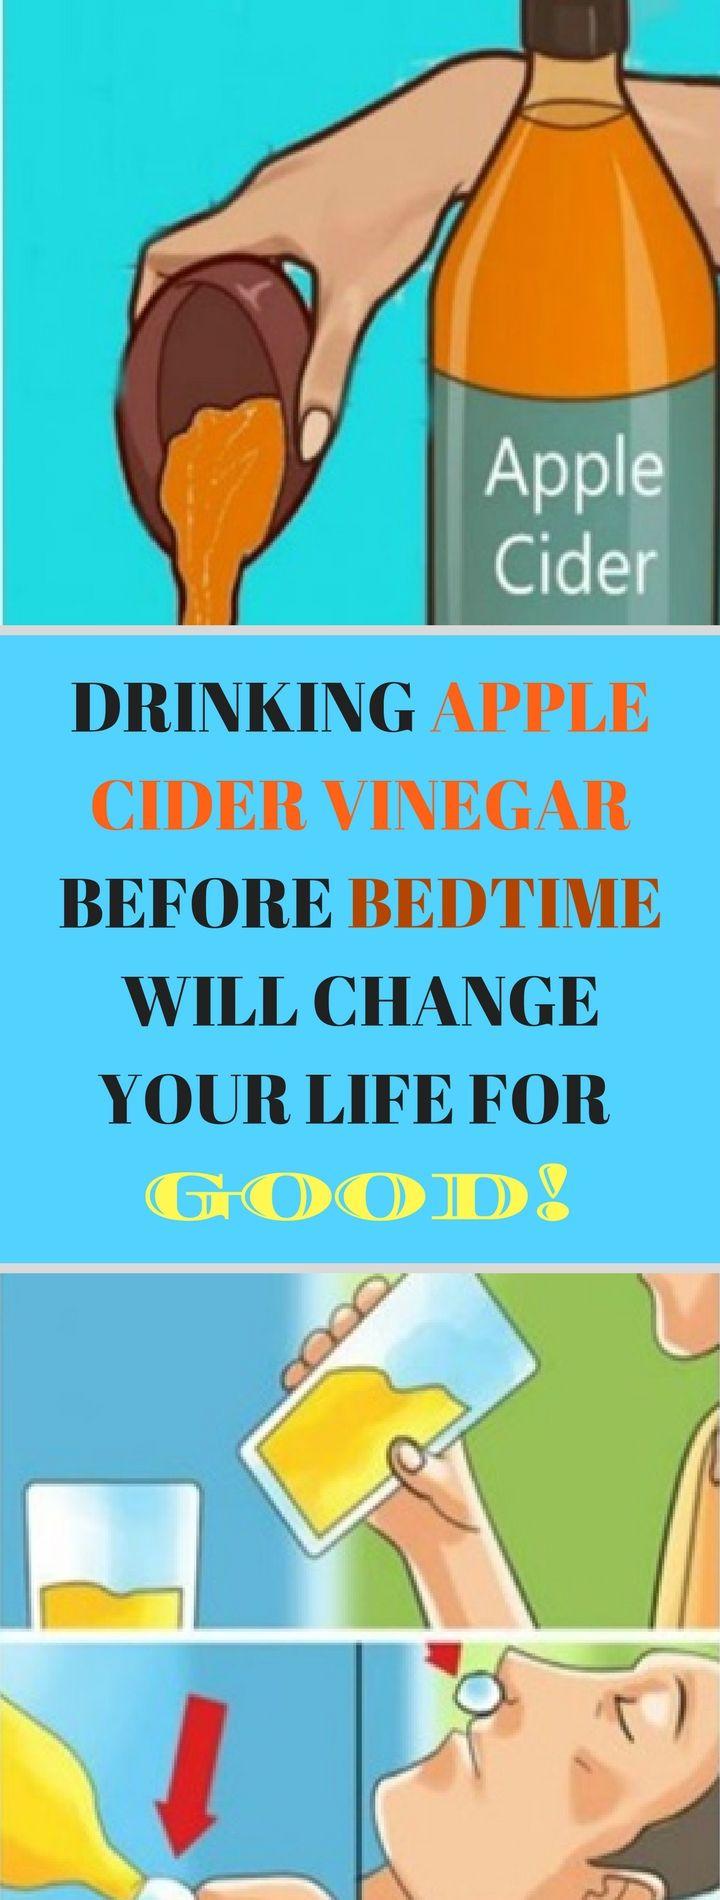 DRINKING APPLE CIDER VINEGAR BEFORE BEDTIME WILL CHANGE YOUR LIFE FOR GOOD*!!